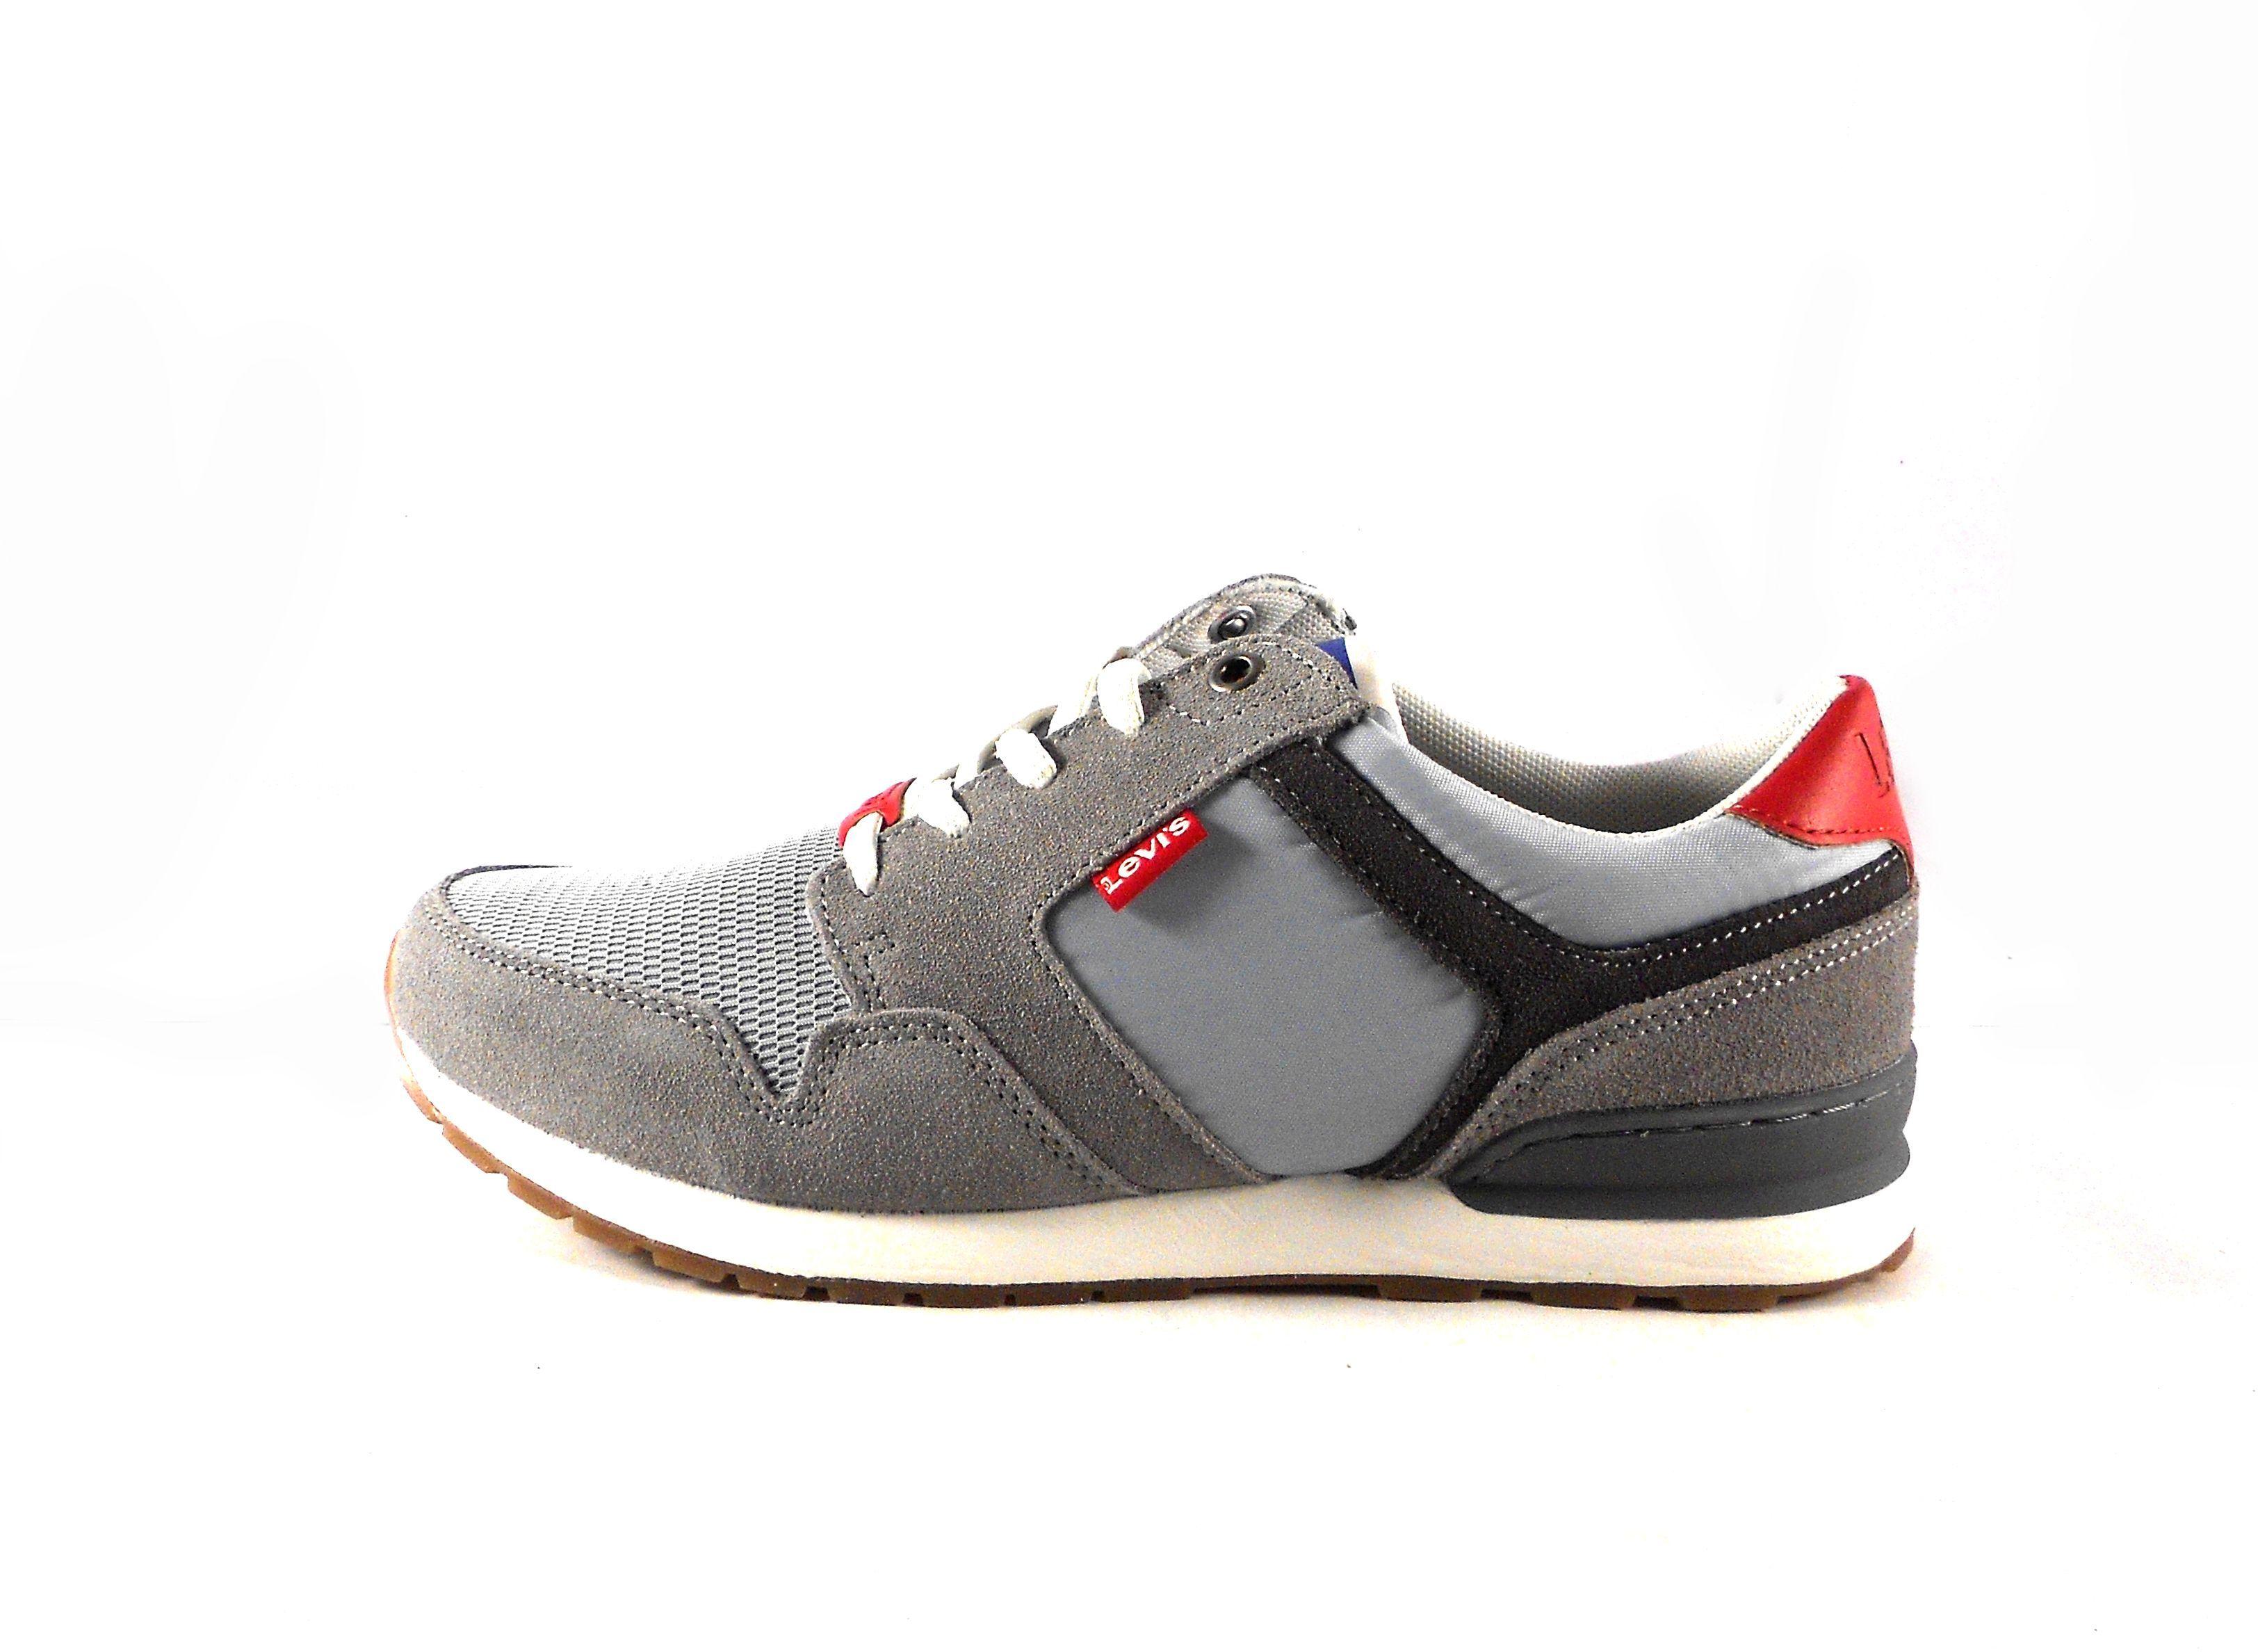 ed90498f7b0 Zapatillas para hombre Levi s NY Runner 2.0 color gris